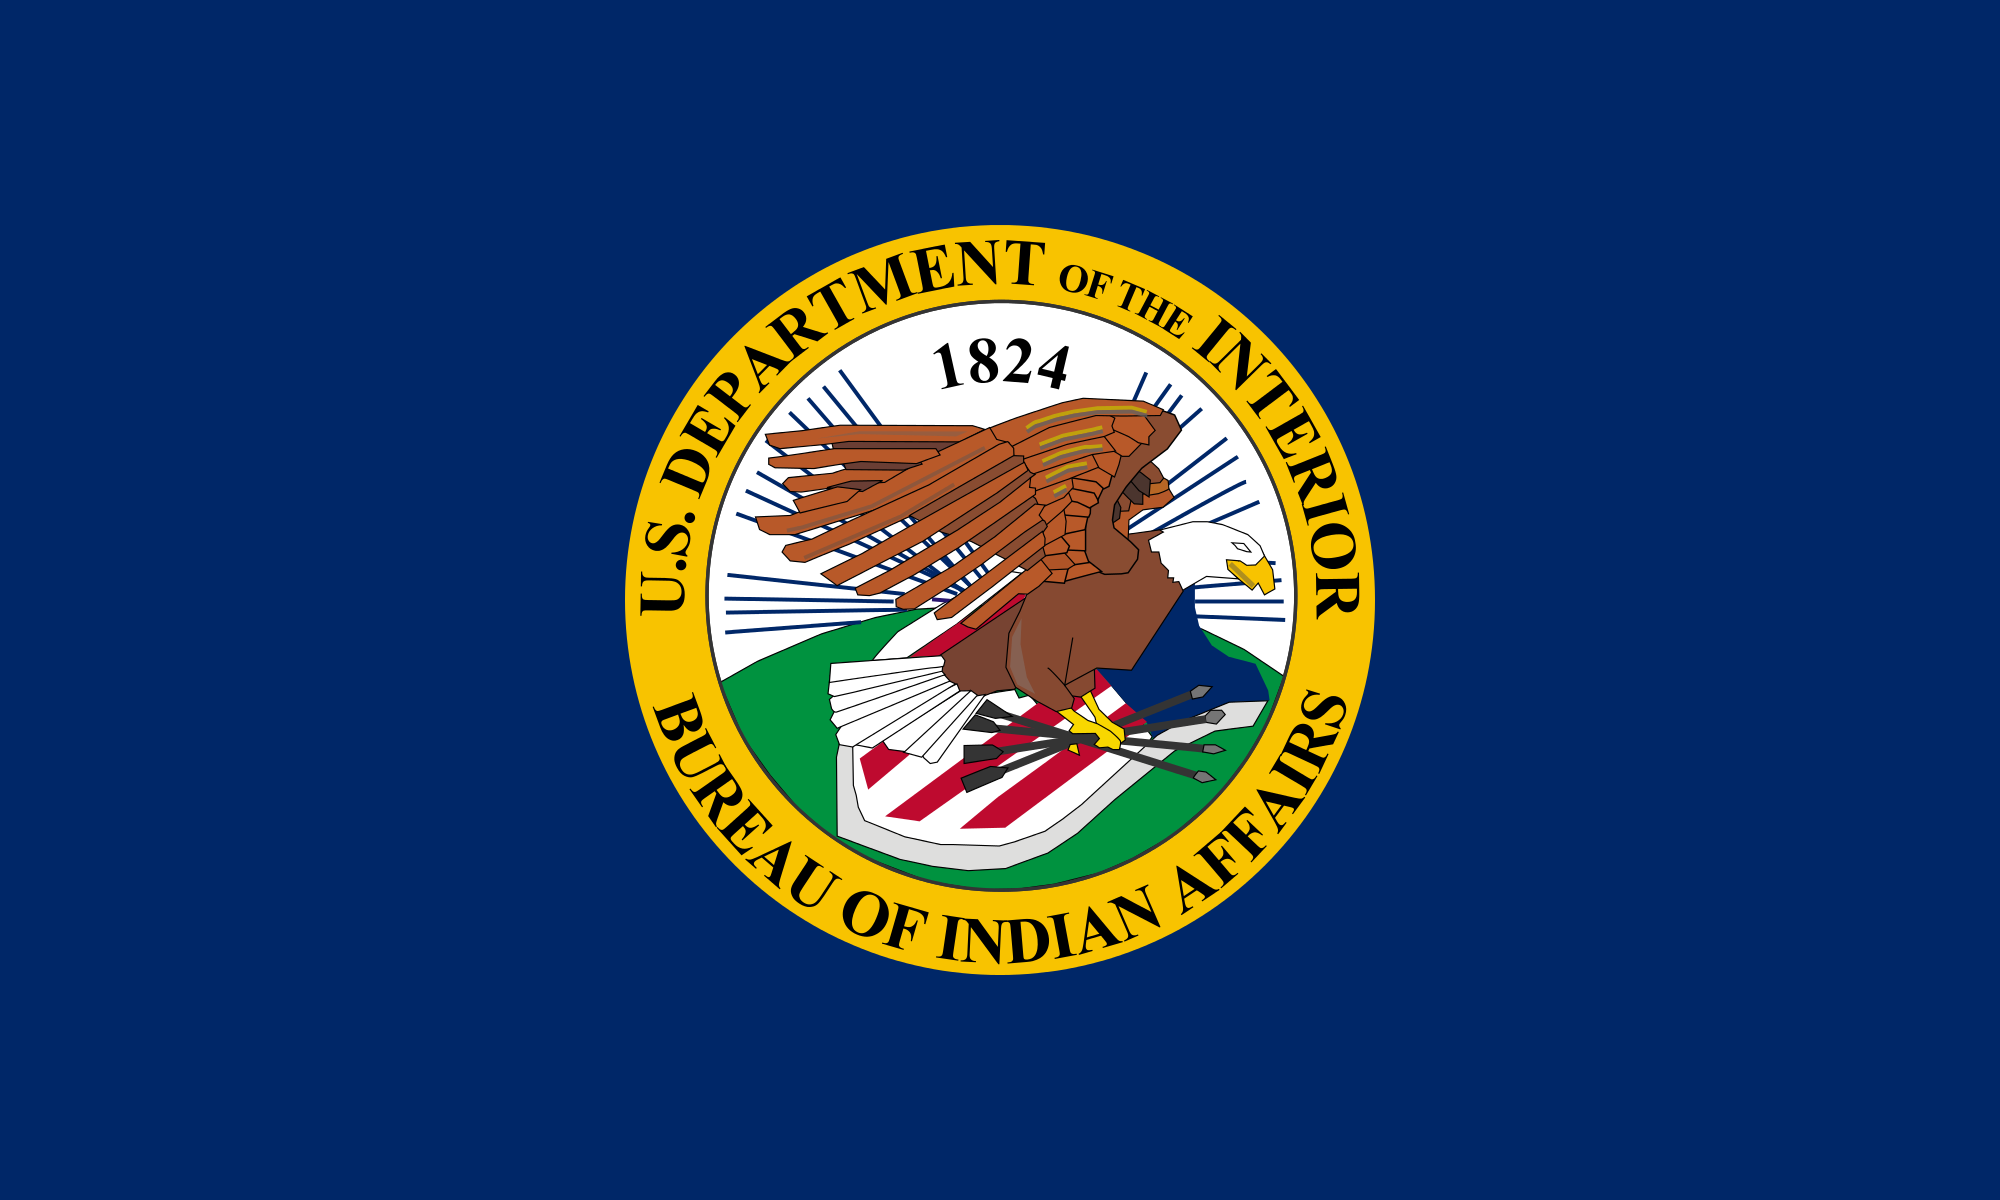 Flag_of_the_United_States_Bureau_of_Indian_Affairs